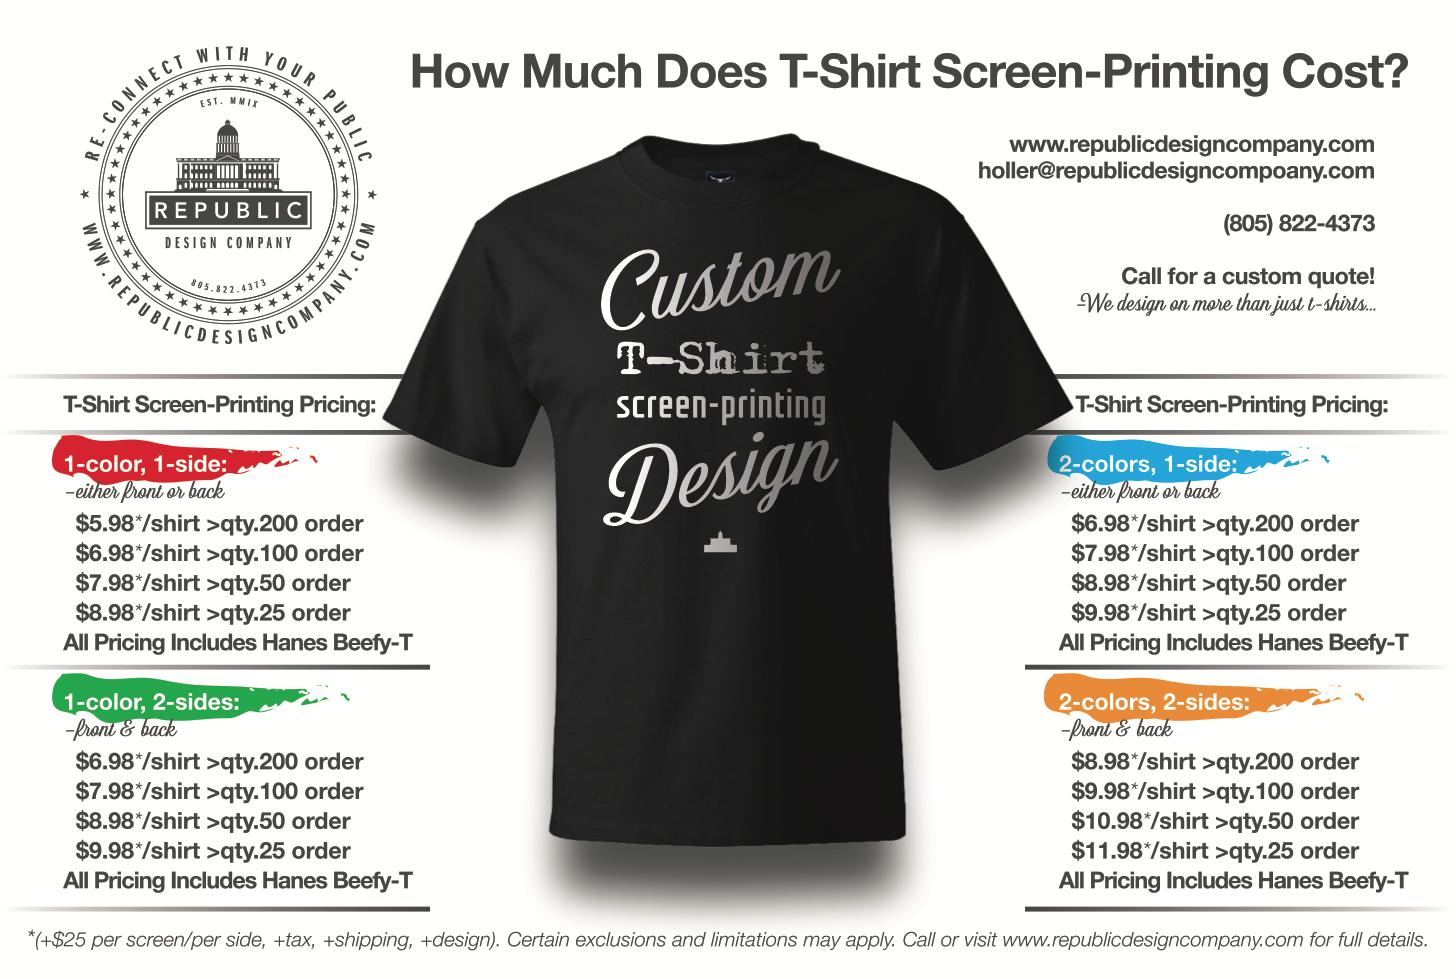 screen print - Republic Design Company